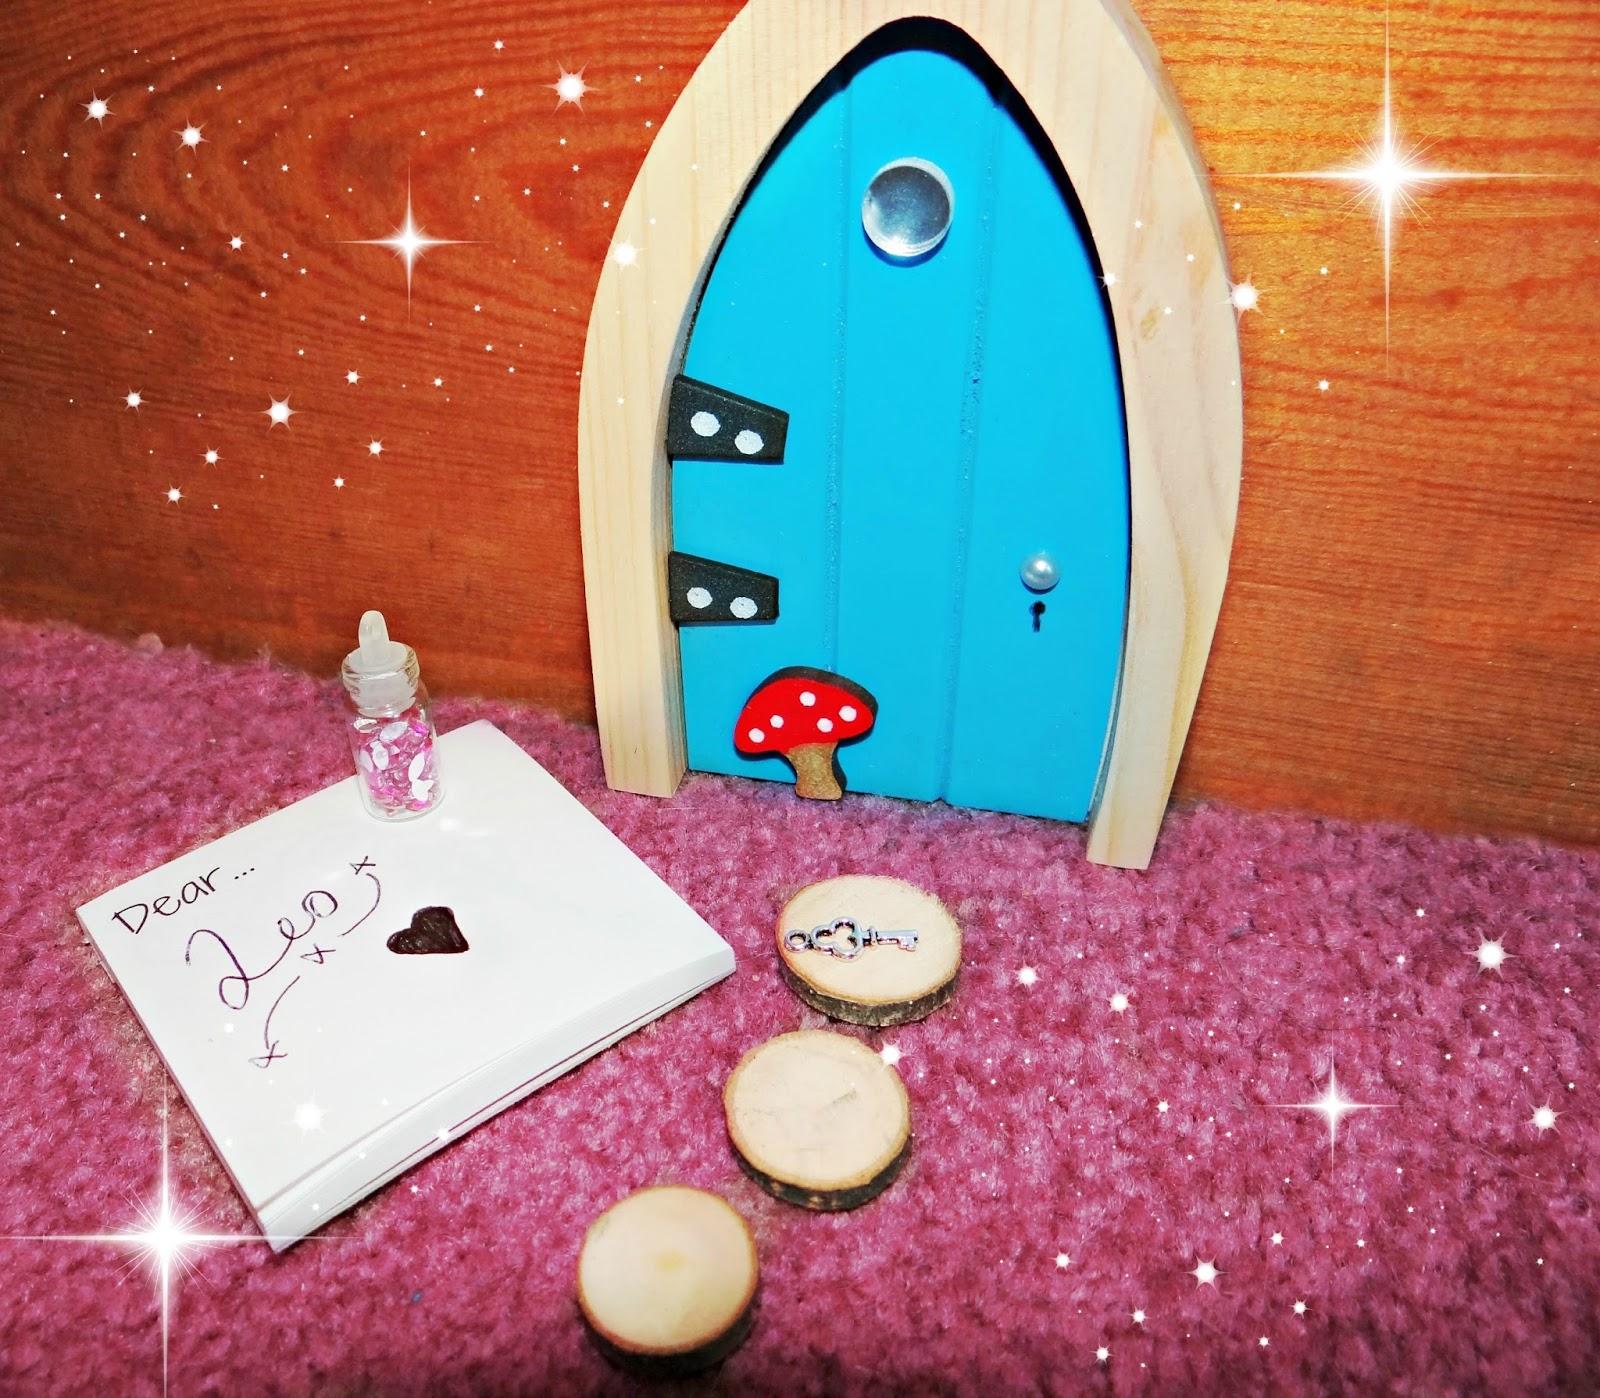 Life unexpected do you believe in magic i wonder for Irish fairy door uk